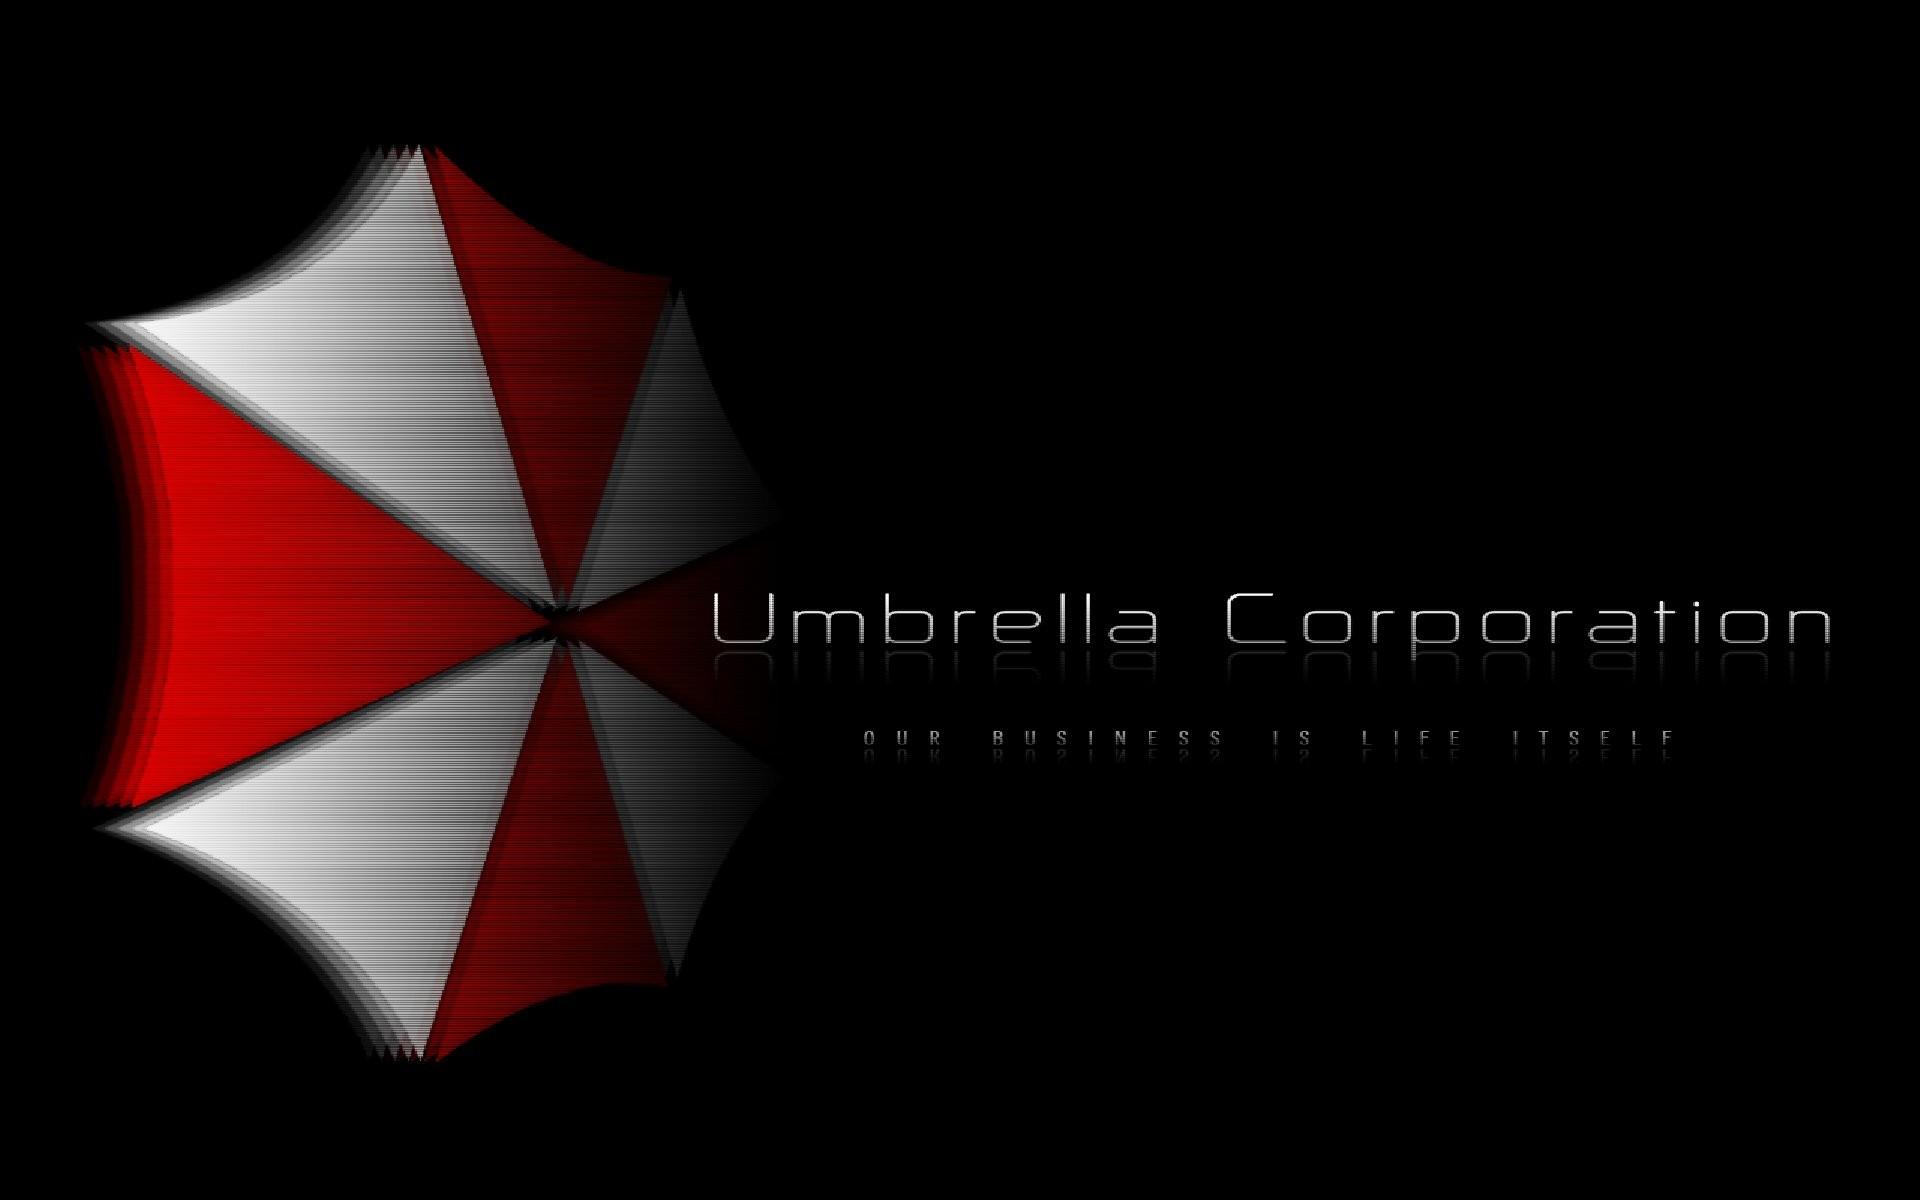 Umbrella Corp_ wallpaper     307543   WallpaperUP